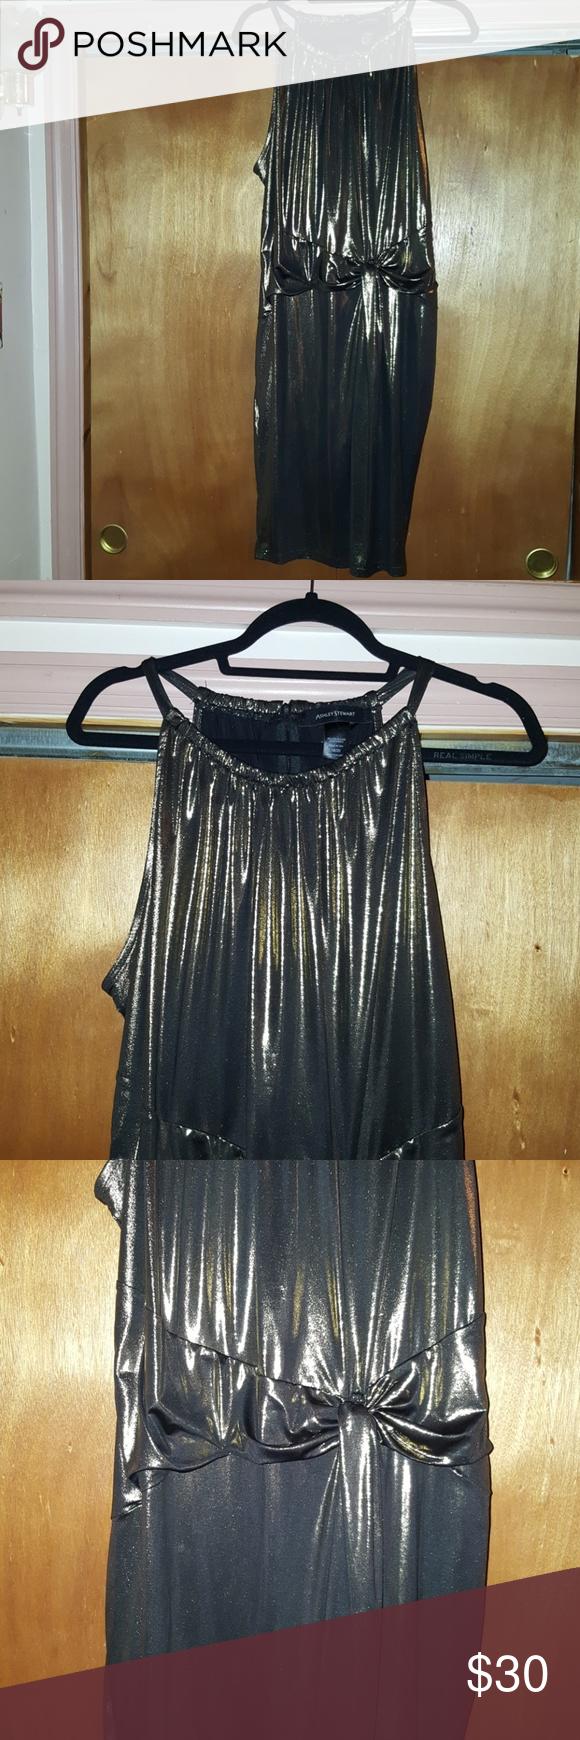 debabc62cea Evening dress Ashley Stewart size 18-20 no sleeve black and gold evening  dress Zips